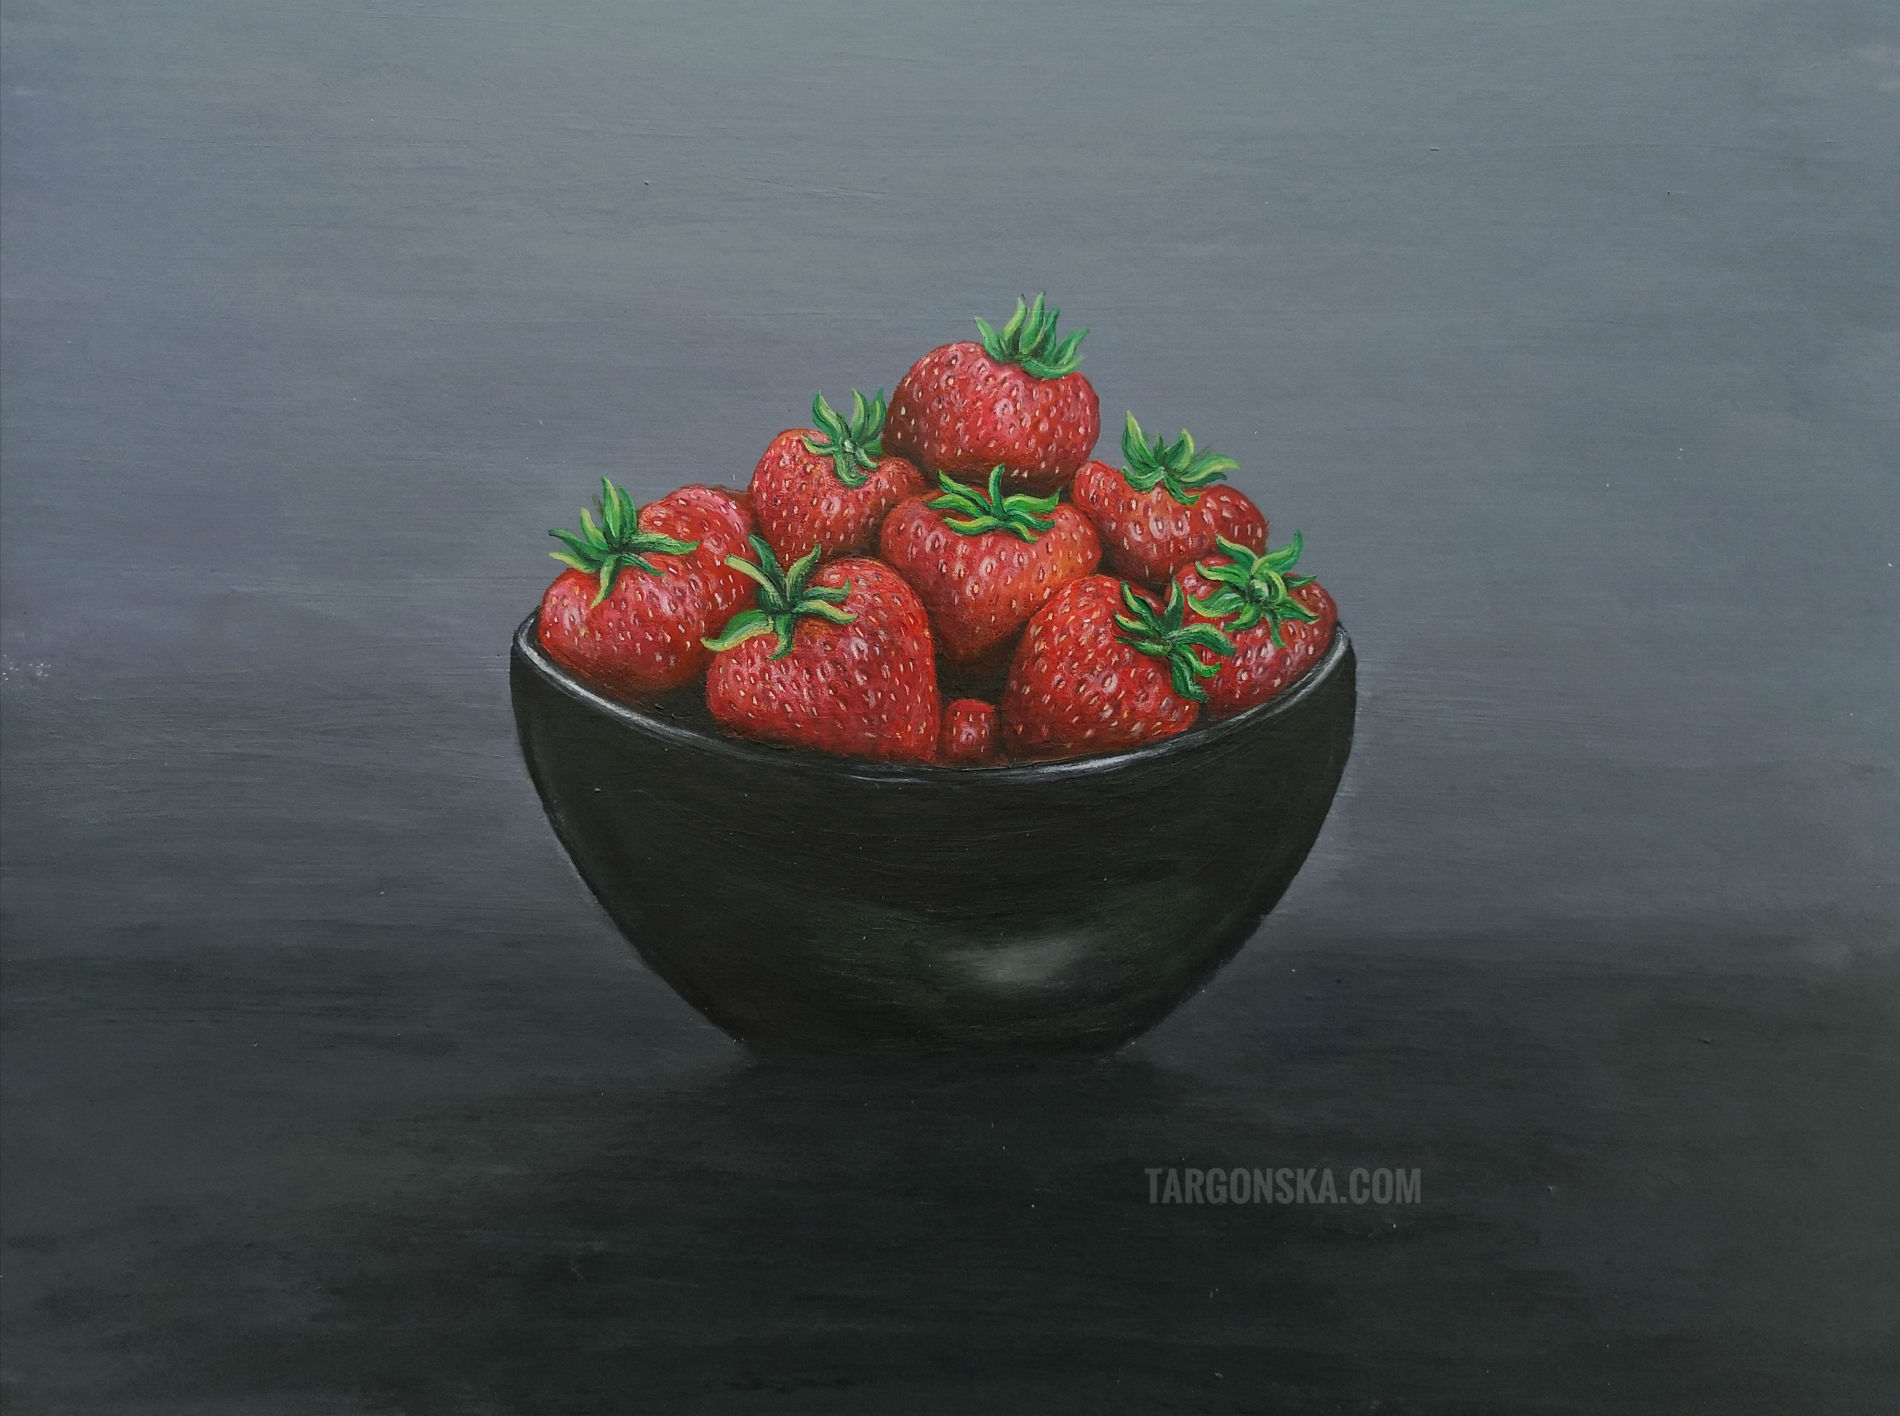 Bowl of strawberries malgorzata targonska